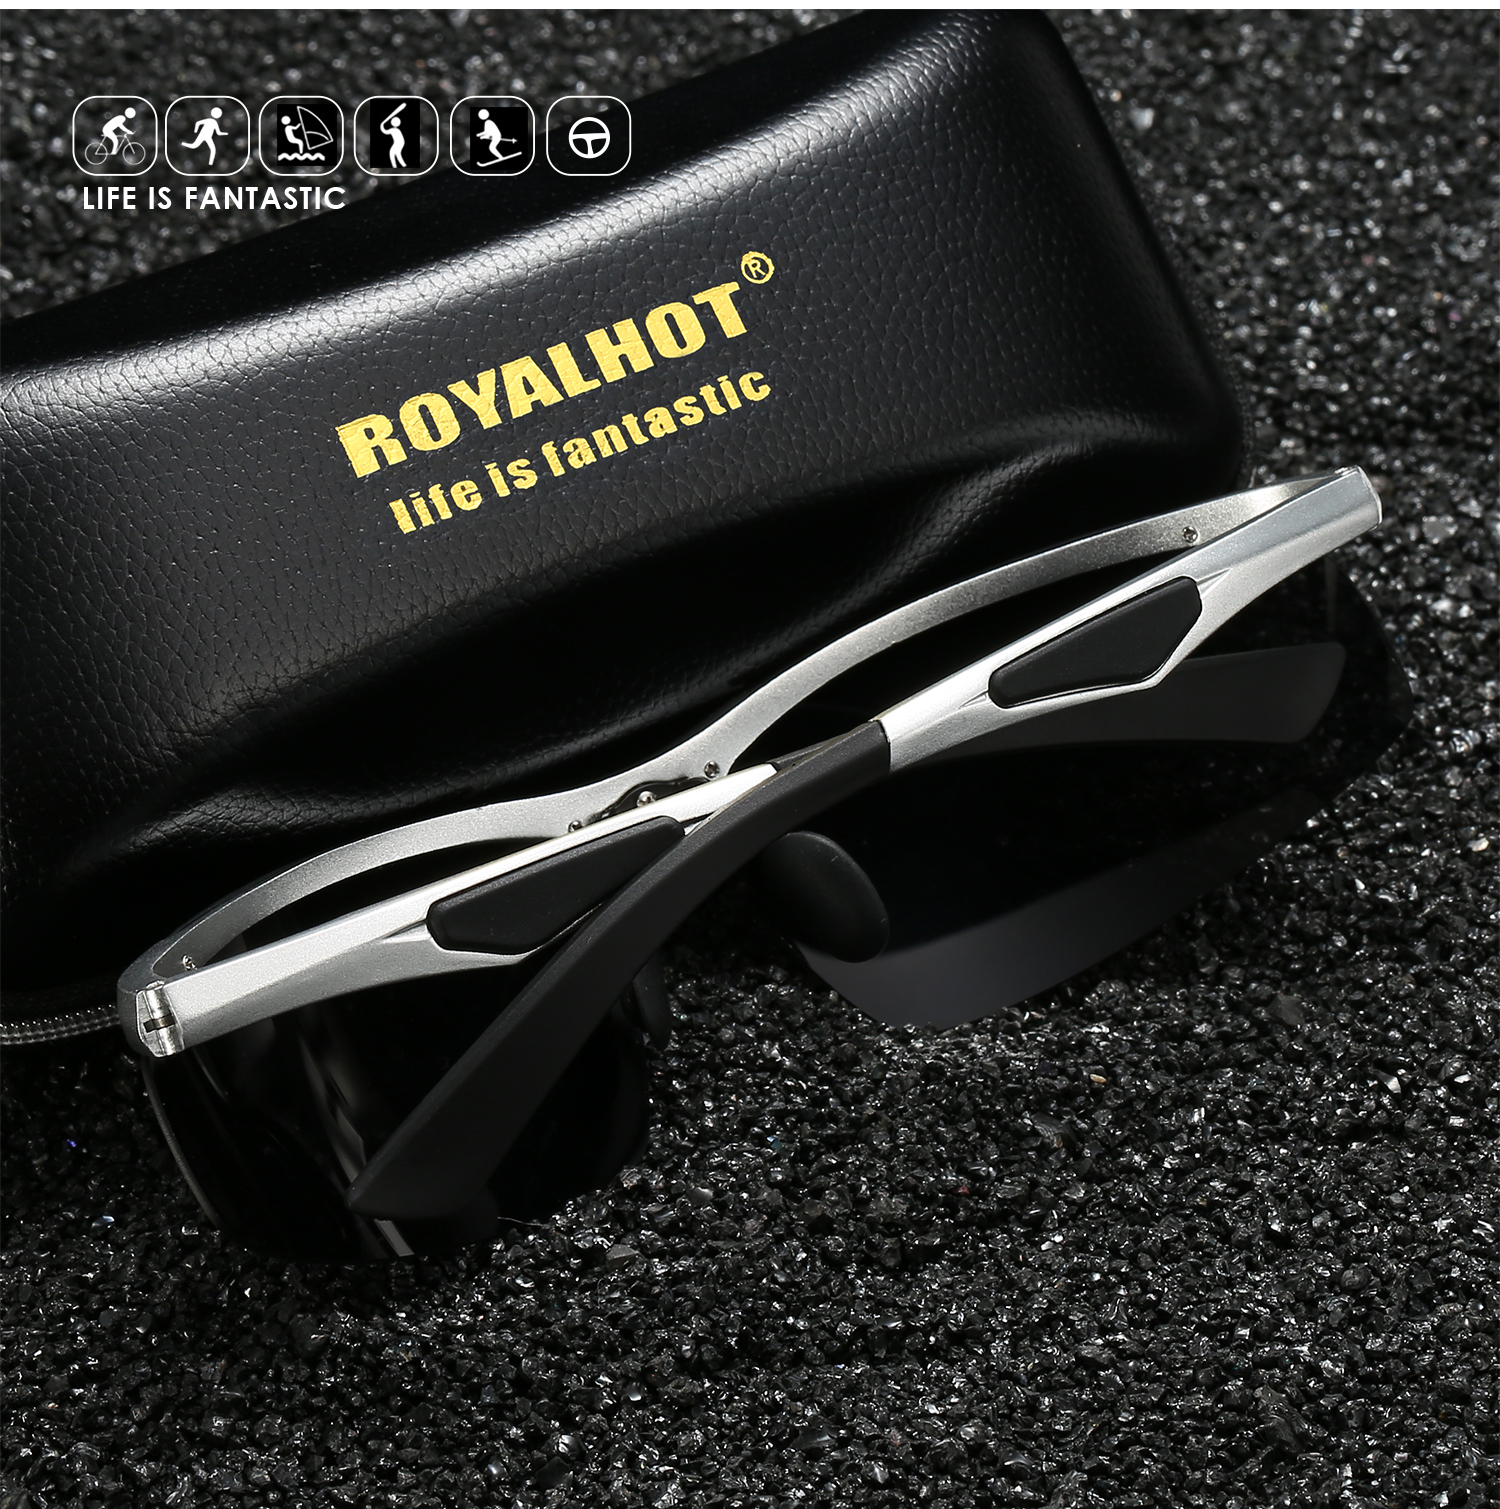 RoyalHot Men Women Polarized Aloy Rectangle Frame Sunglasses Driving Sun Glasses Shades Oculos masculino Male p60011